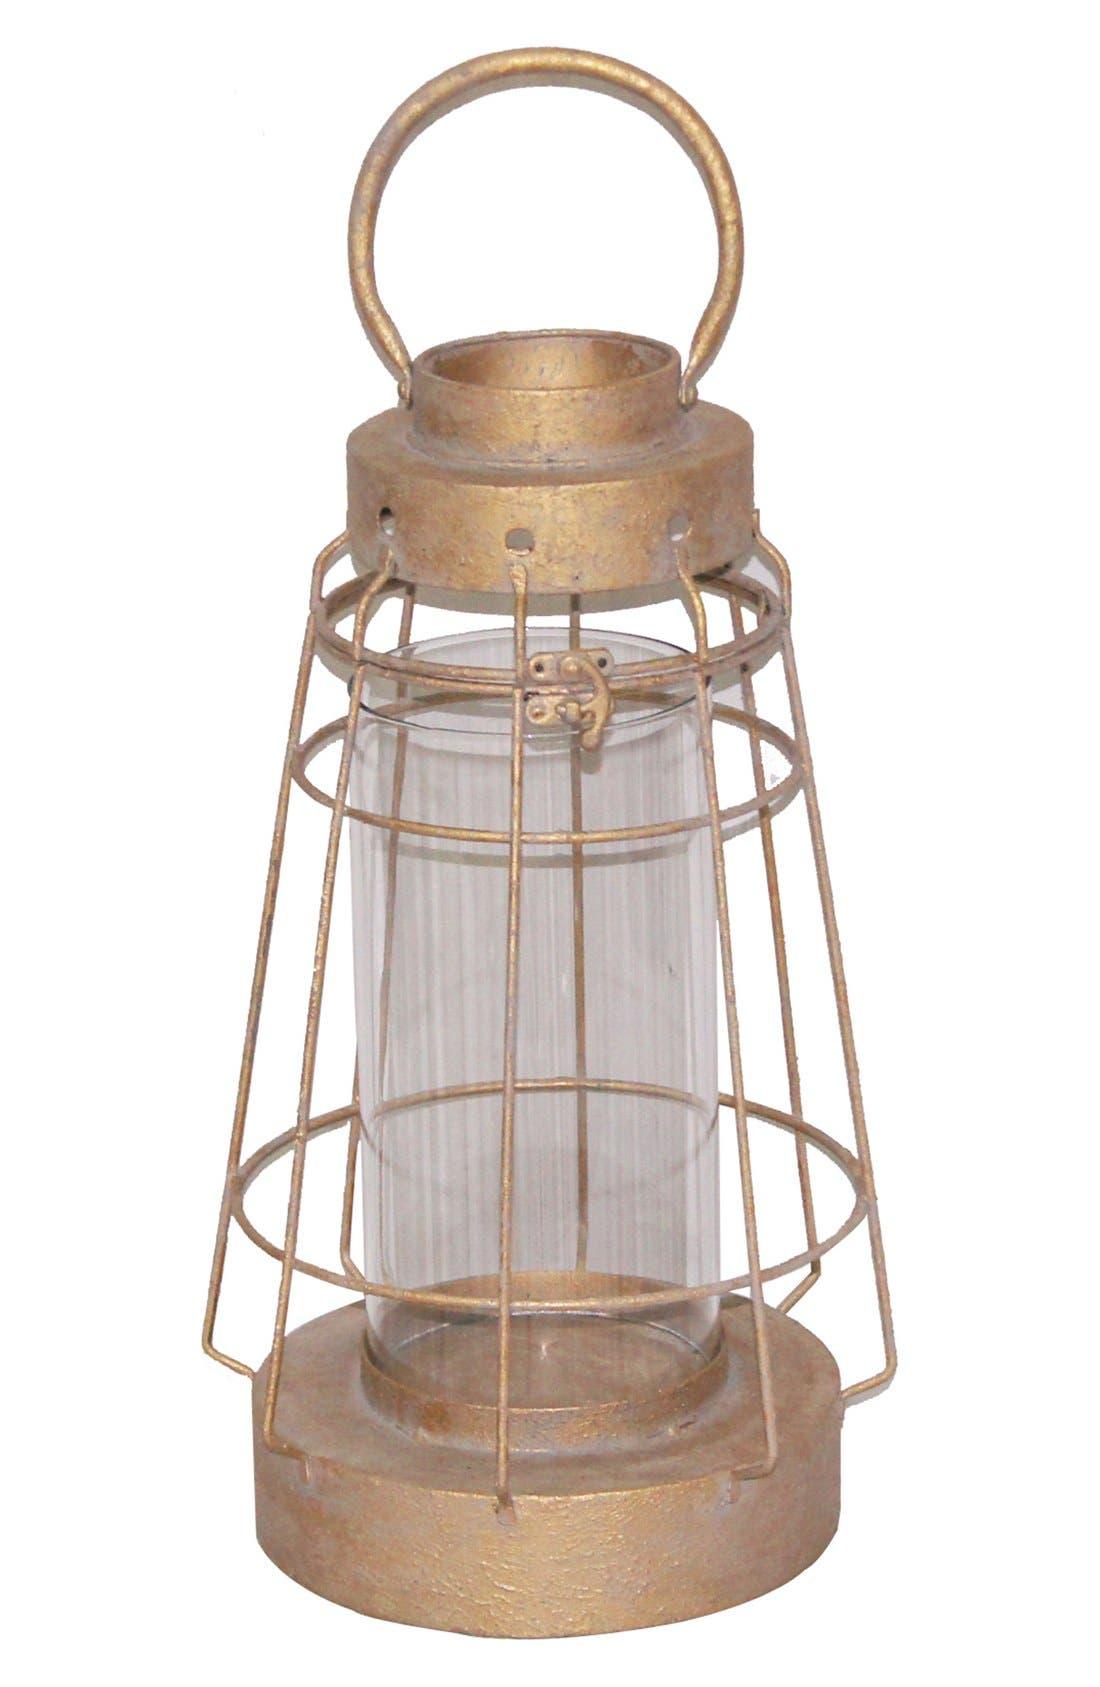 Wood & Metal Lantern Candle Holder,                             Main thumbnail 1, color,                             710